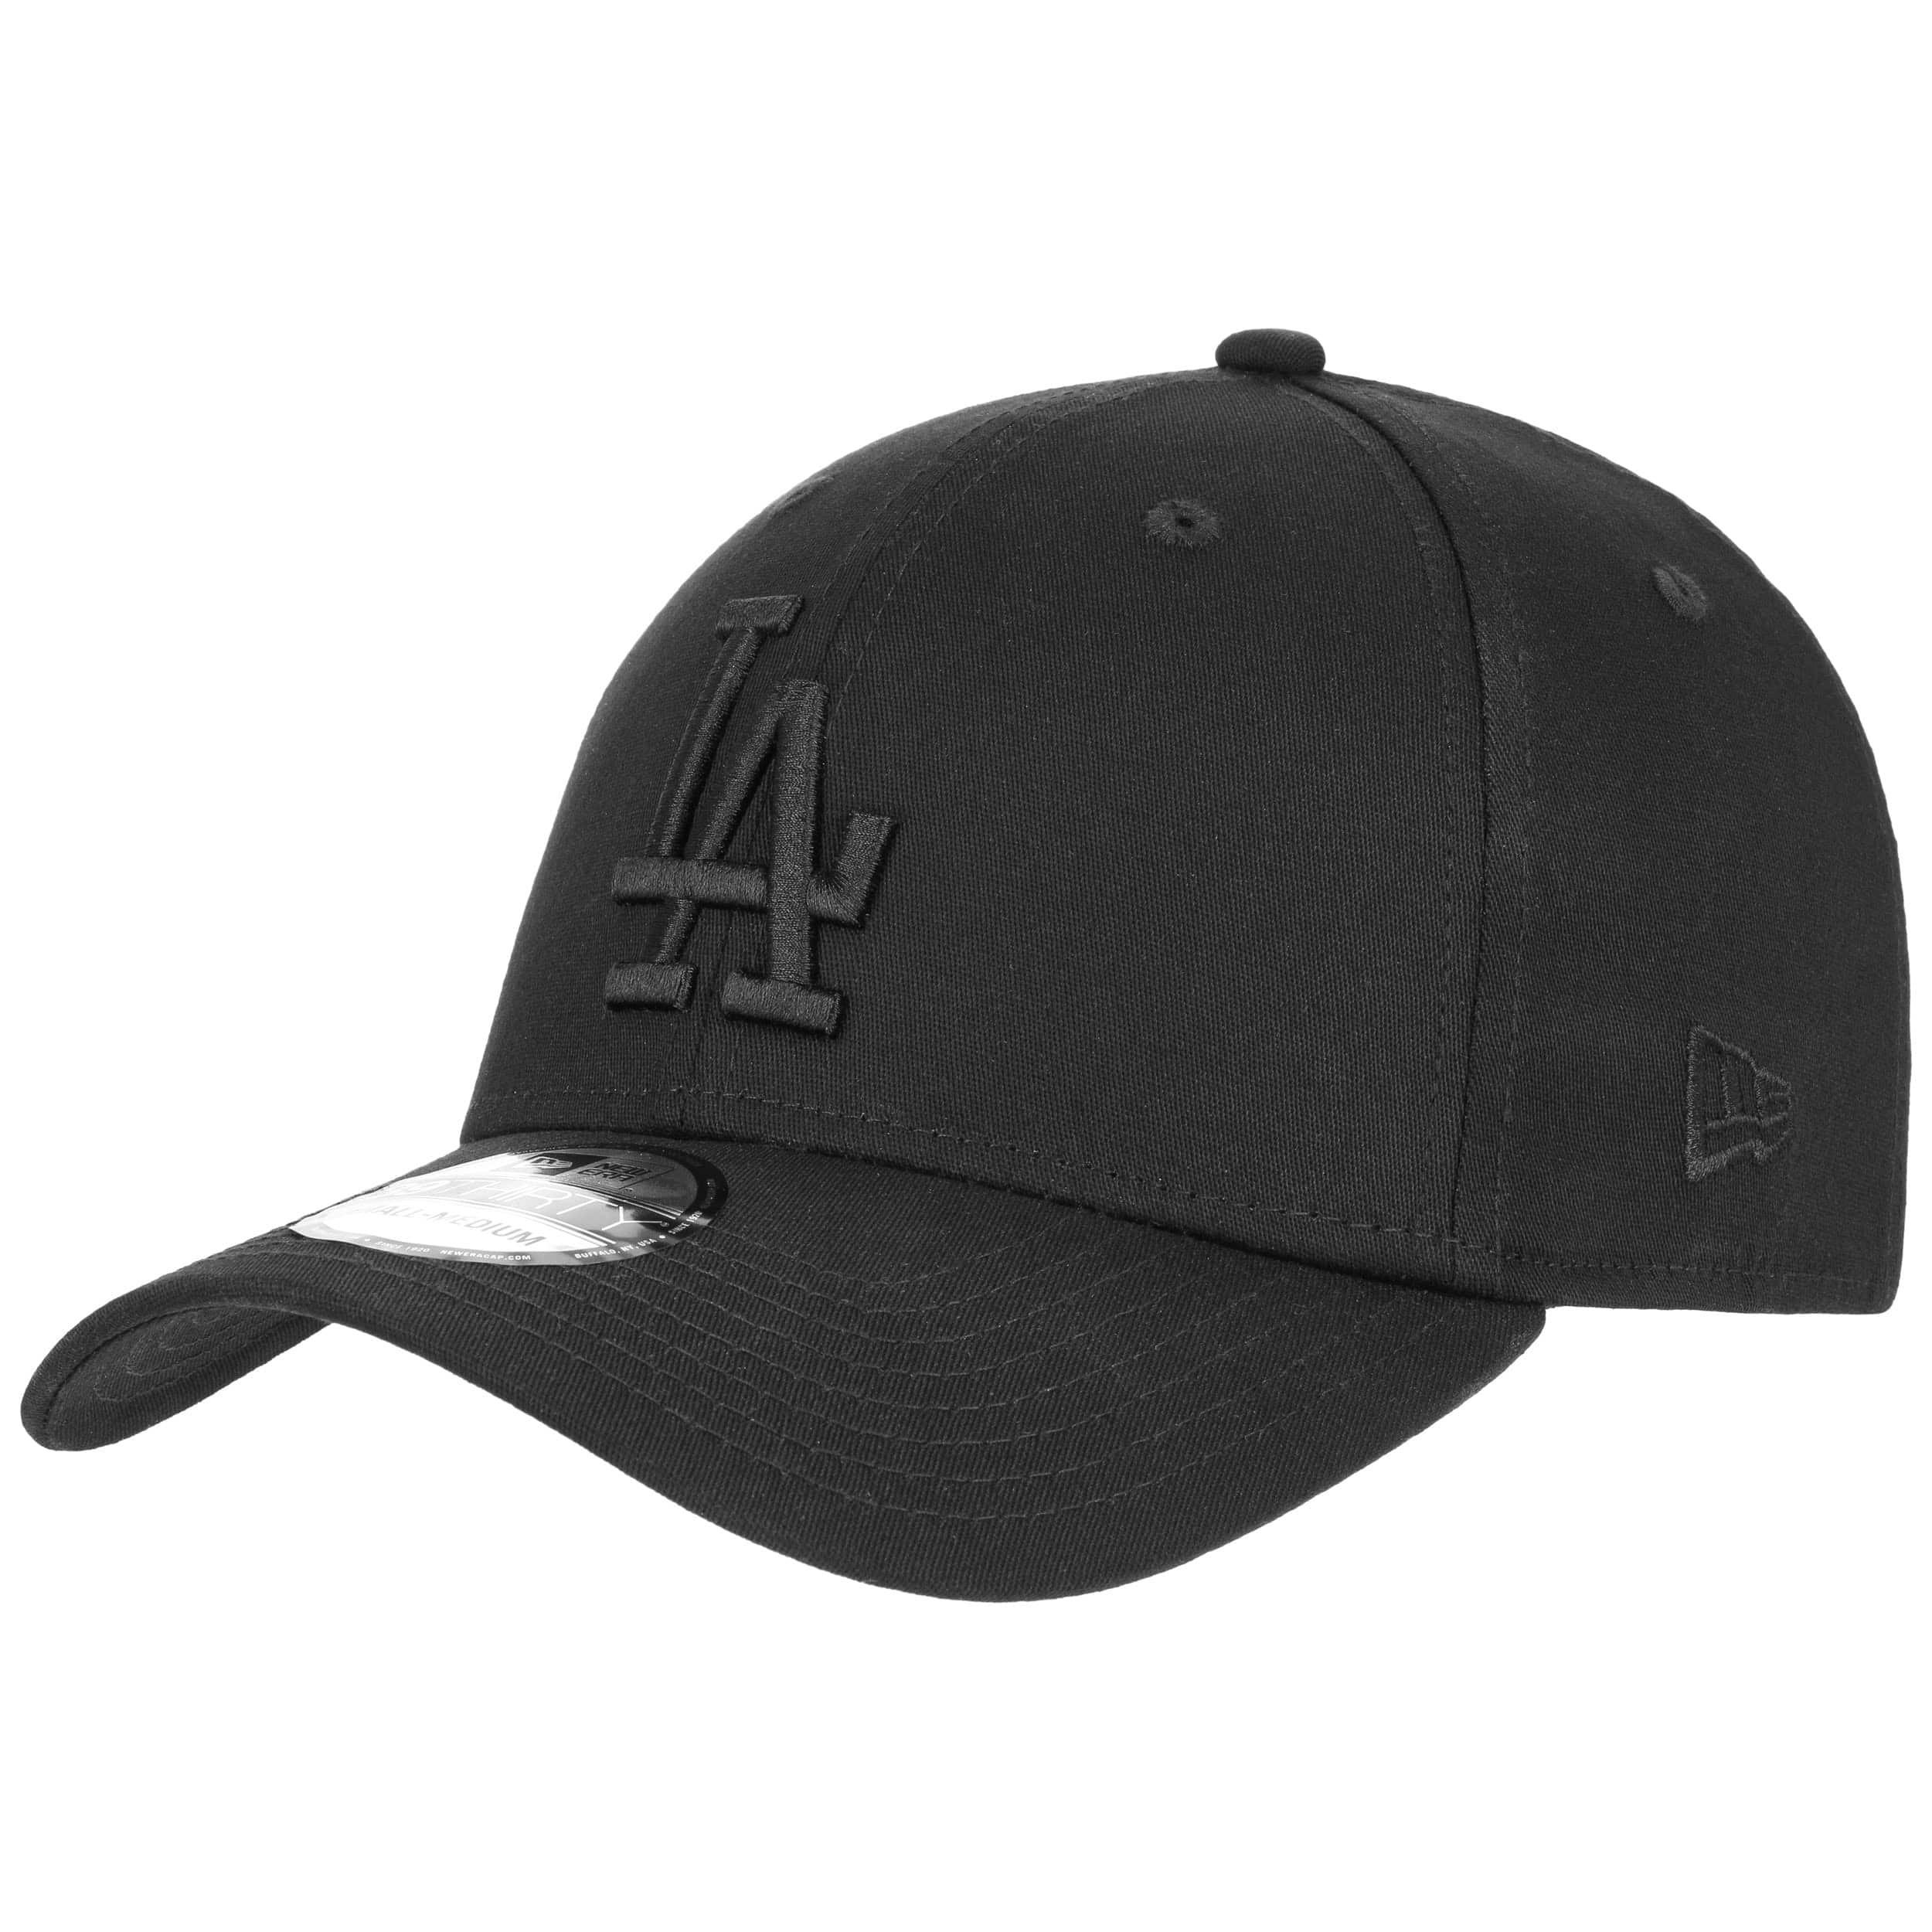 39thirty bob dodgers cap by new era eur 24 95 hats caps beanies shop online. Black Bedroom Furniture Sets. Home Design Ideas